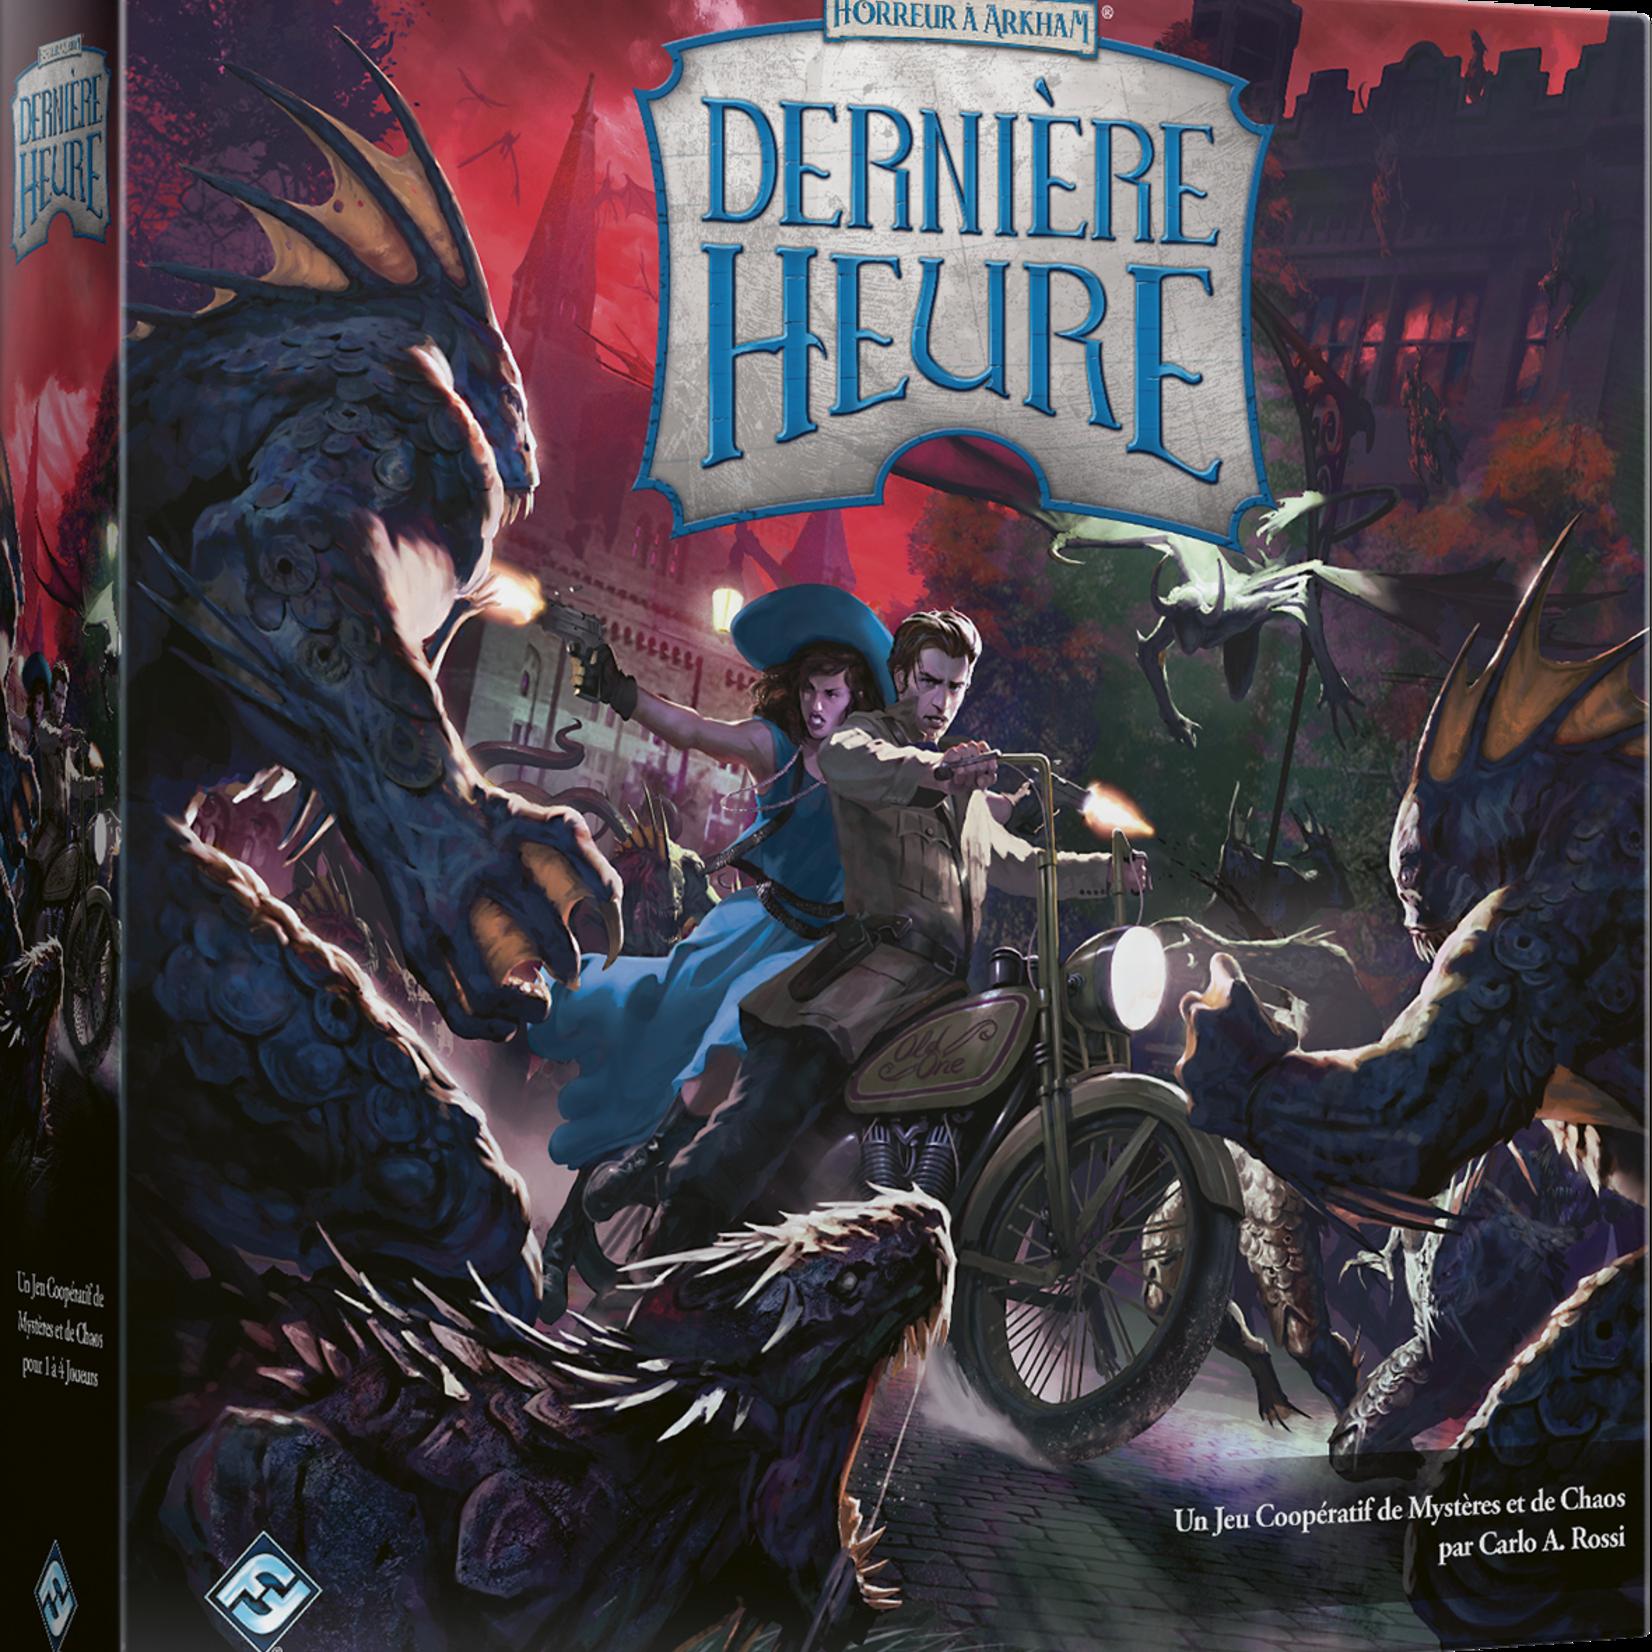 FANTASY FLIGHT HORREUR A ARKHAM : DERNIERE HEURE (FR)